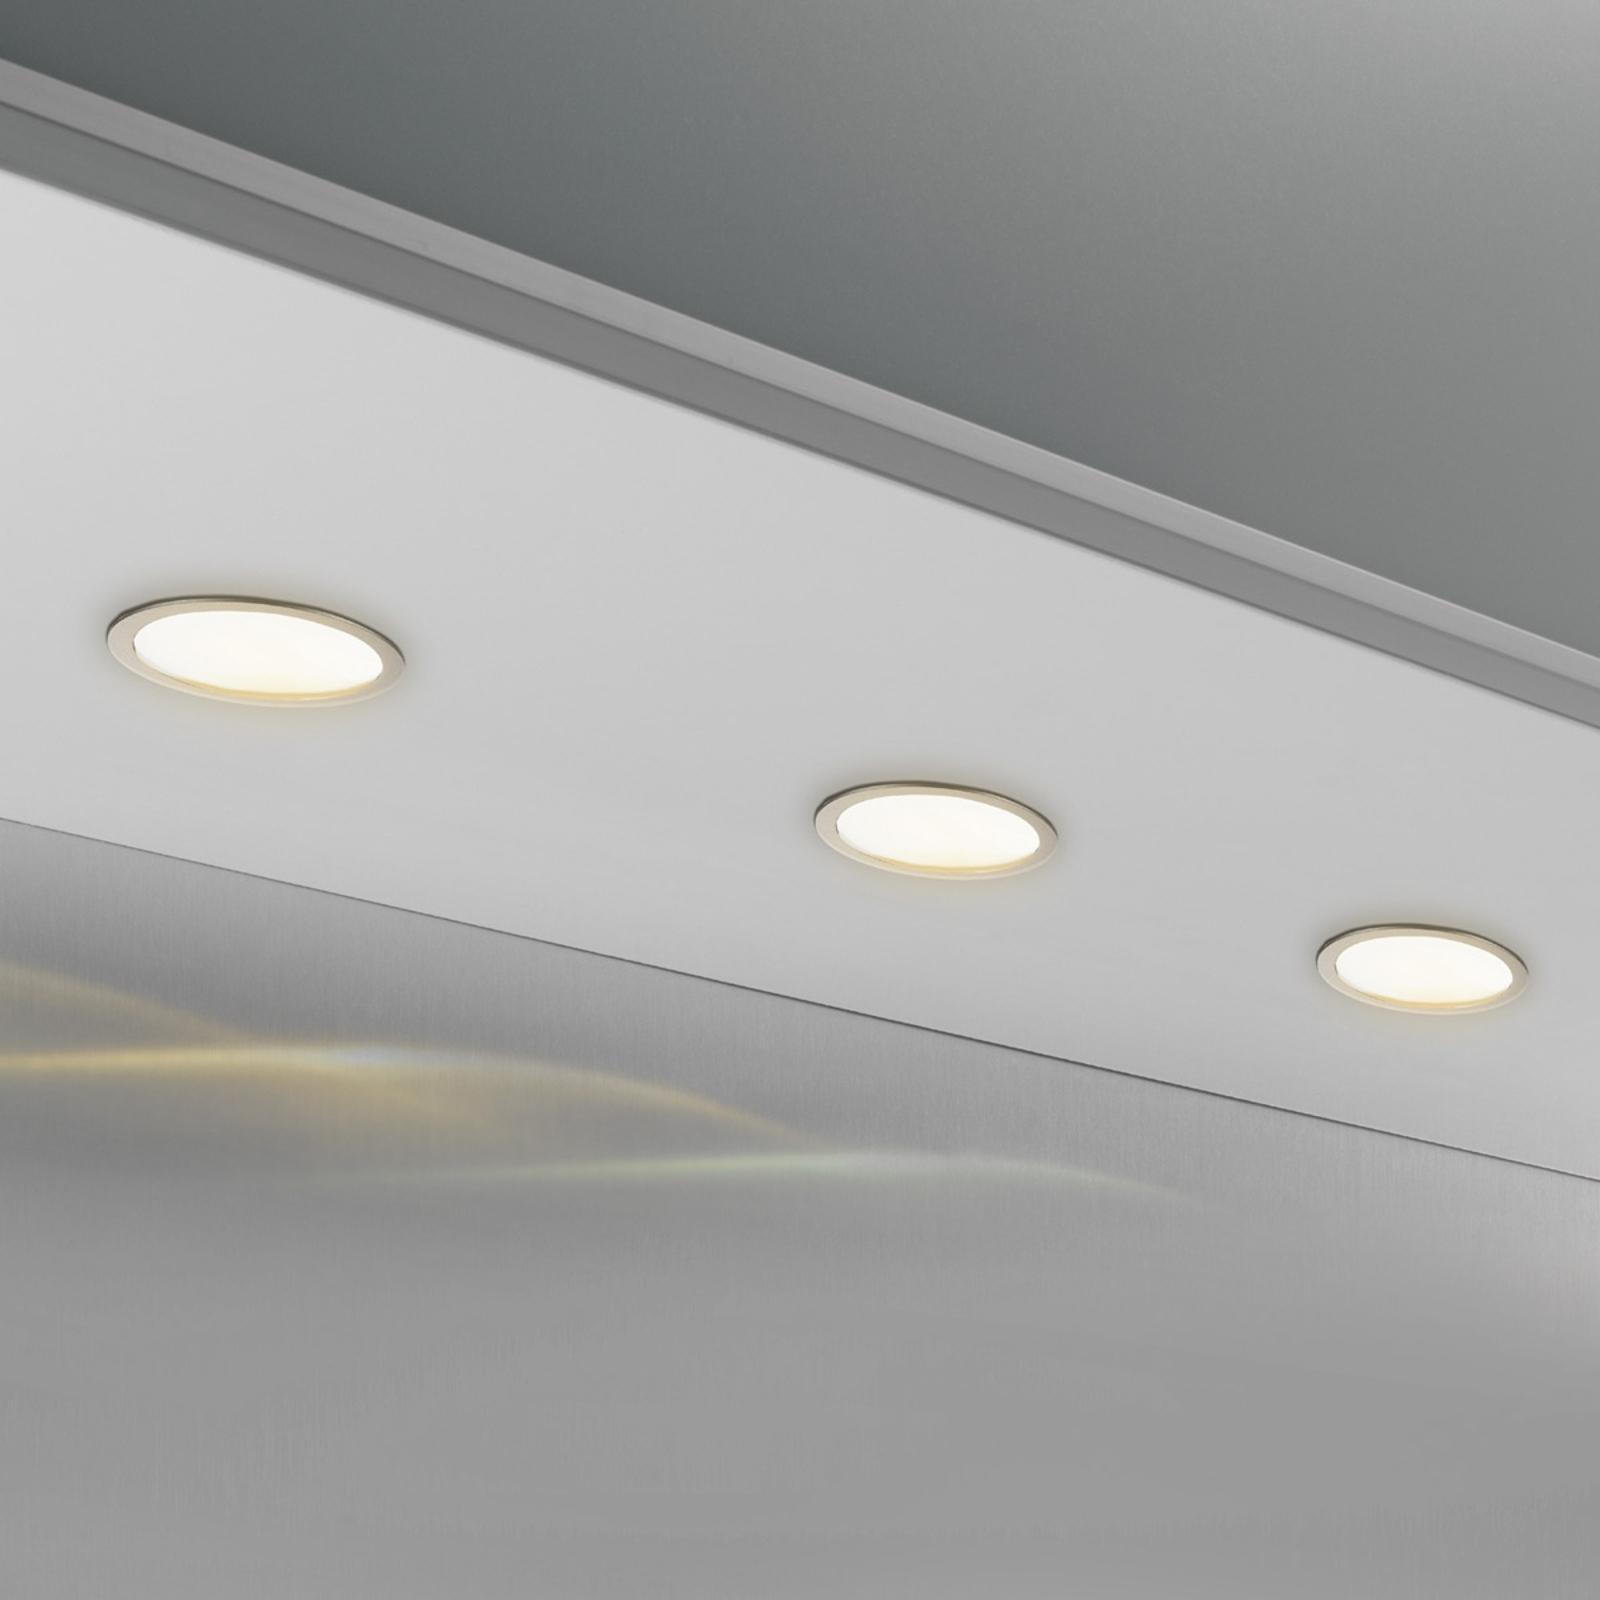 Recessed light Cubic 68, 3,500 K round nickel_3025089_1